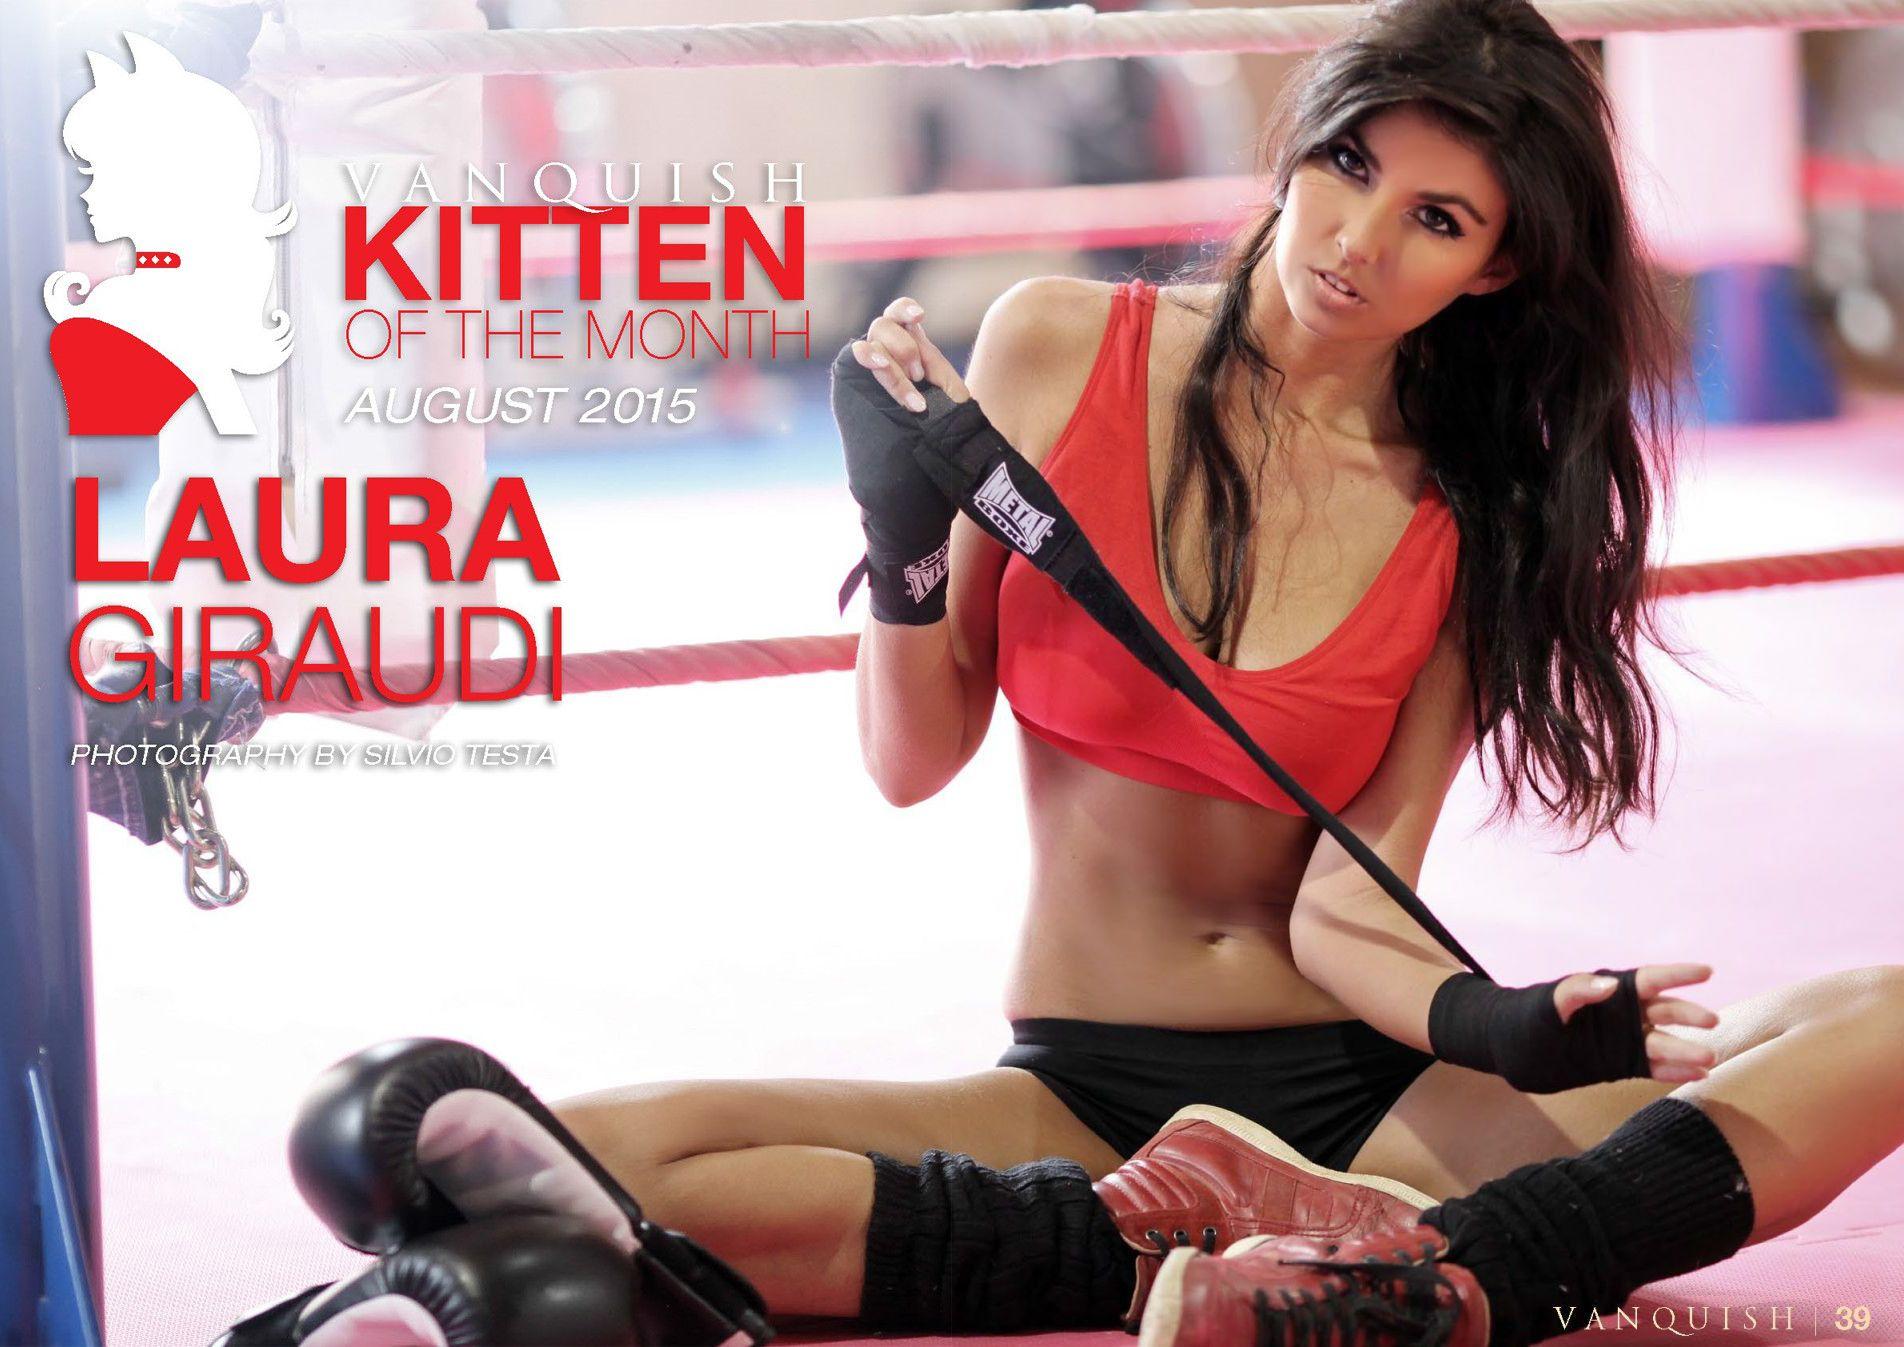 Laura Giraudi Topless (13 Photos)